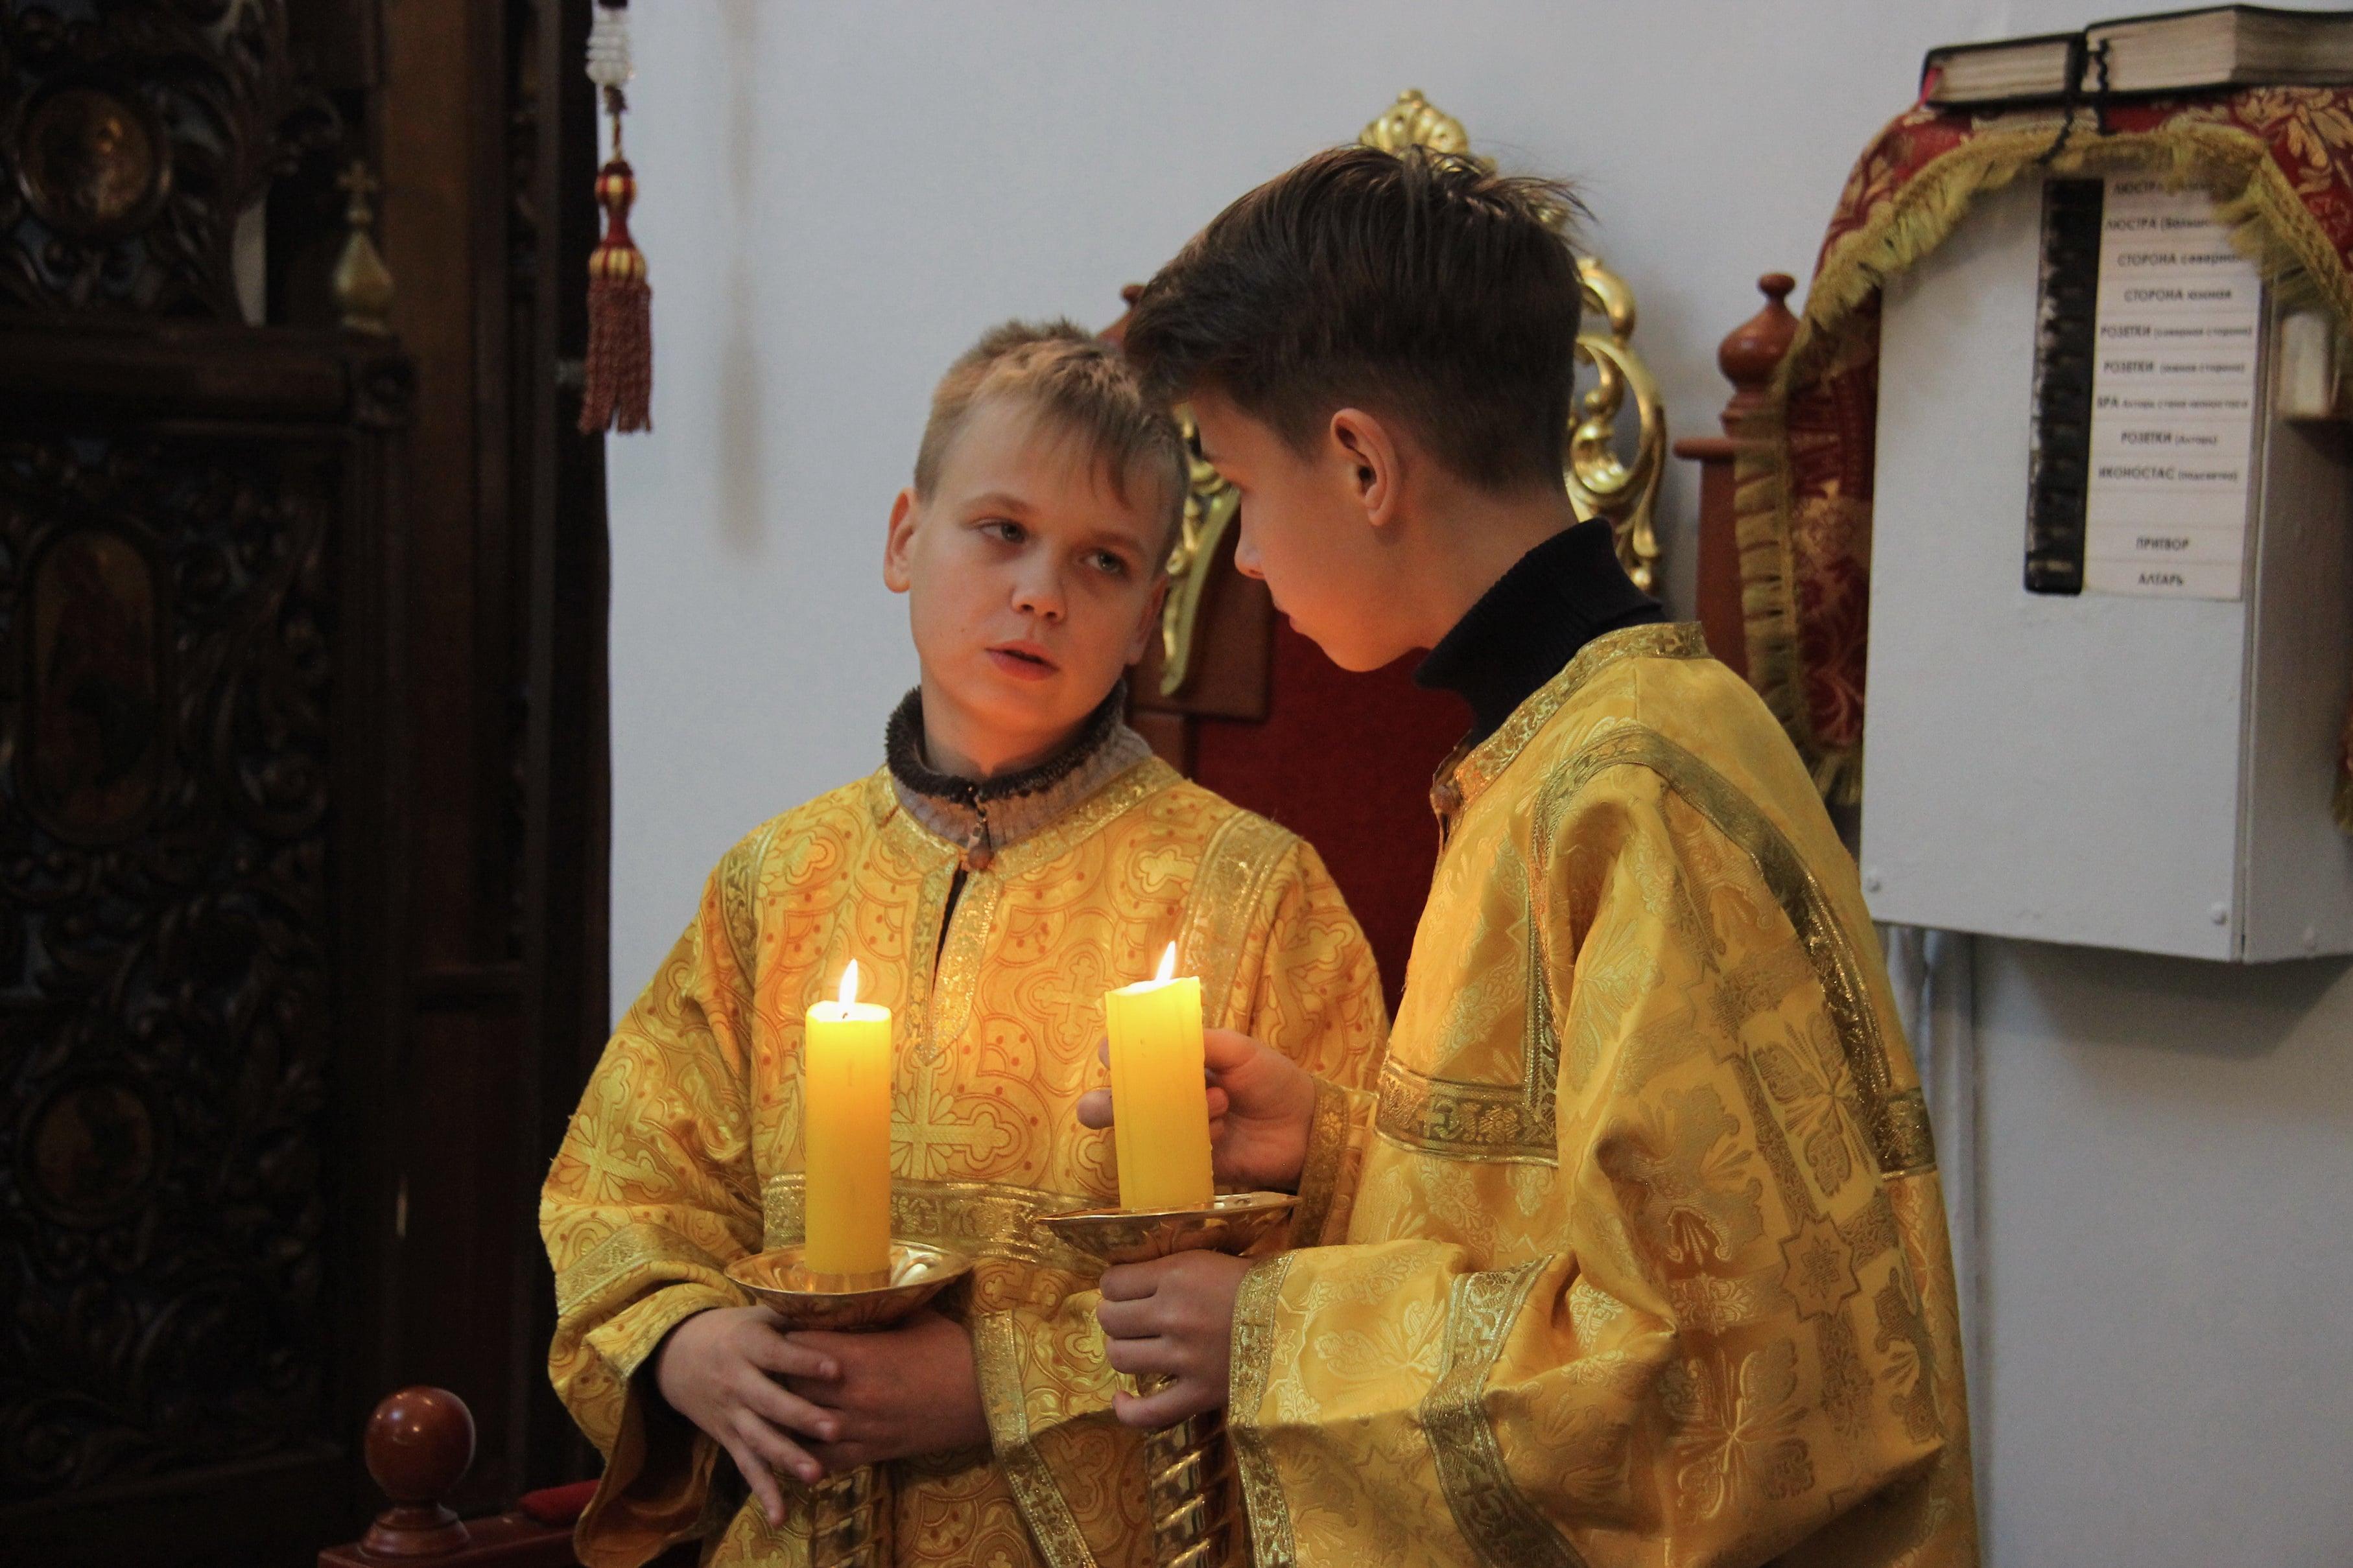 http://monuspen.ru/photoreports/3c874390d6c7e197ab267854c3ce957o.JPG